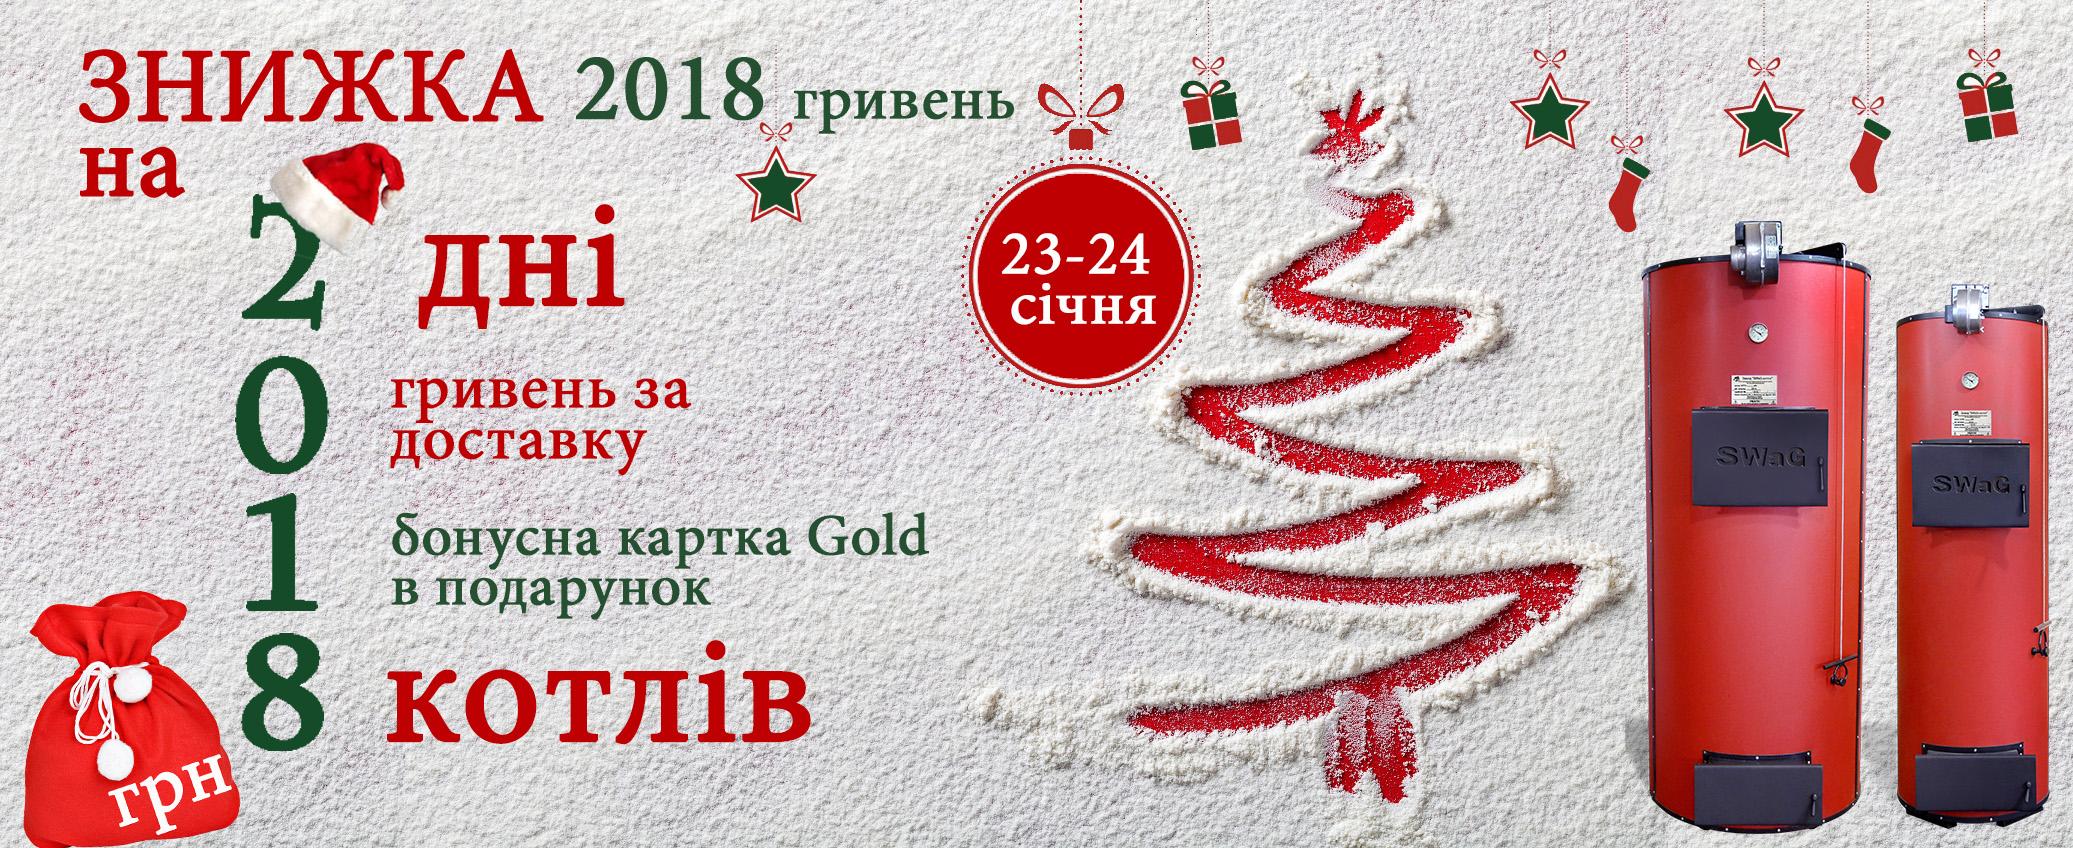 http://www.dreamstime.com/stock-photos-christmas-background-tree-flour-white-flour-looks-like-snow-top-view-image44456473